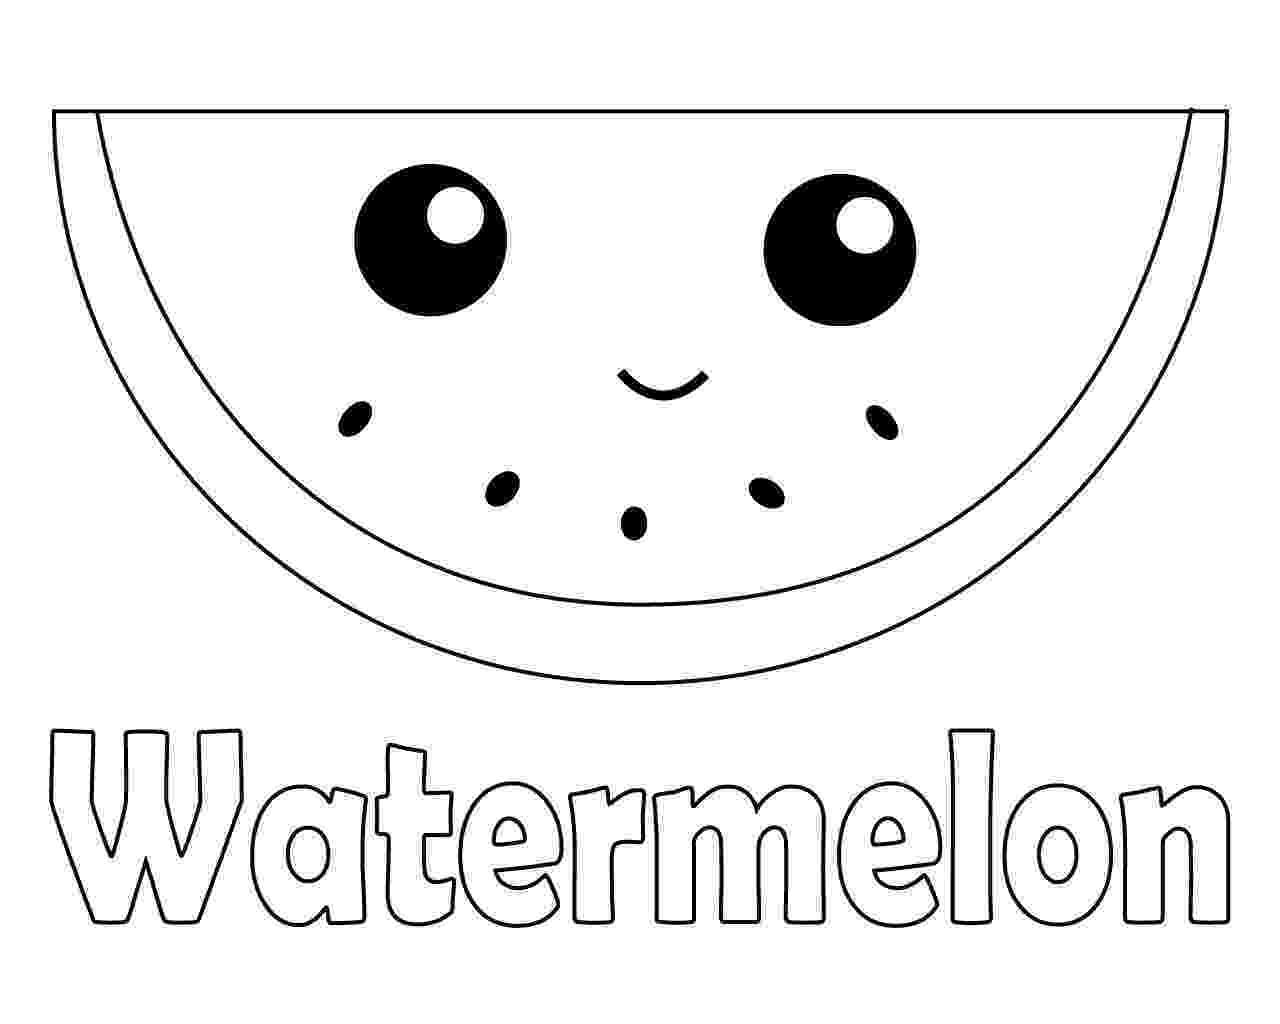 watermelon coloring sheets watermelon coloring pages getcoloringpagescom watermelon sheets coloring